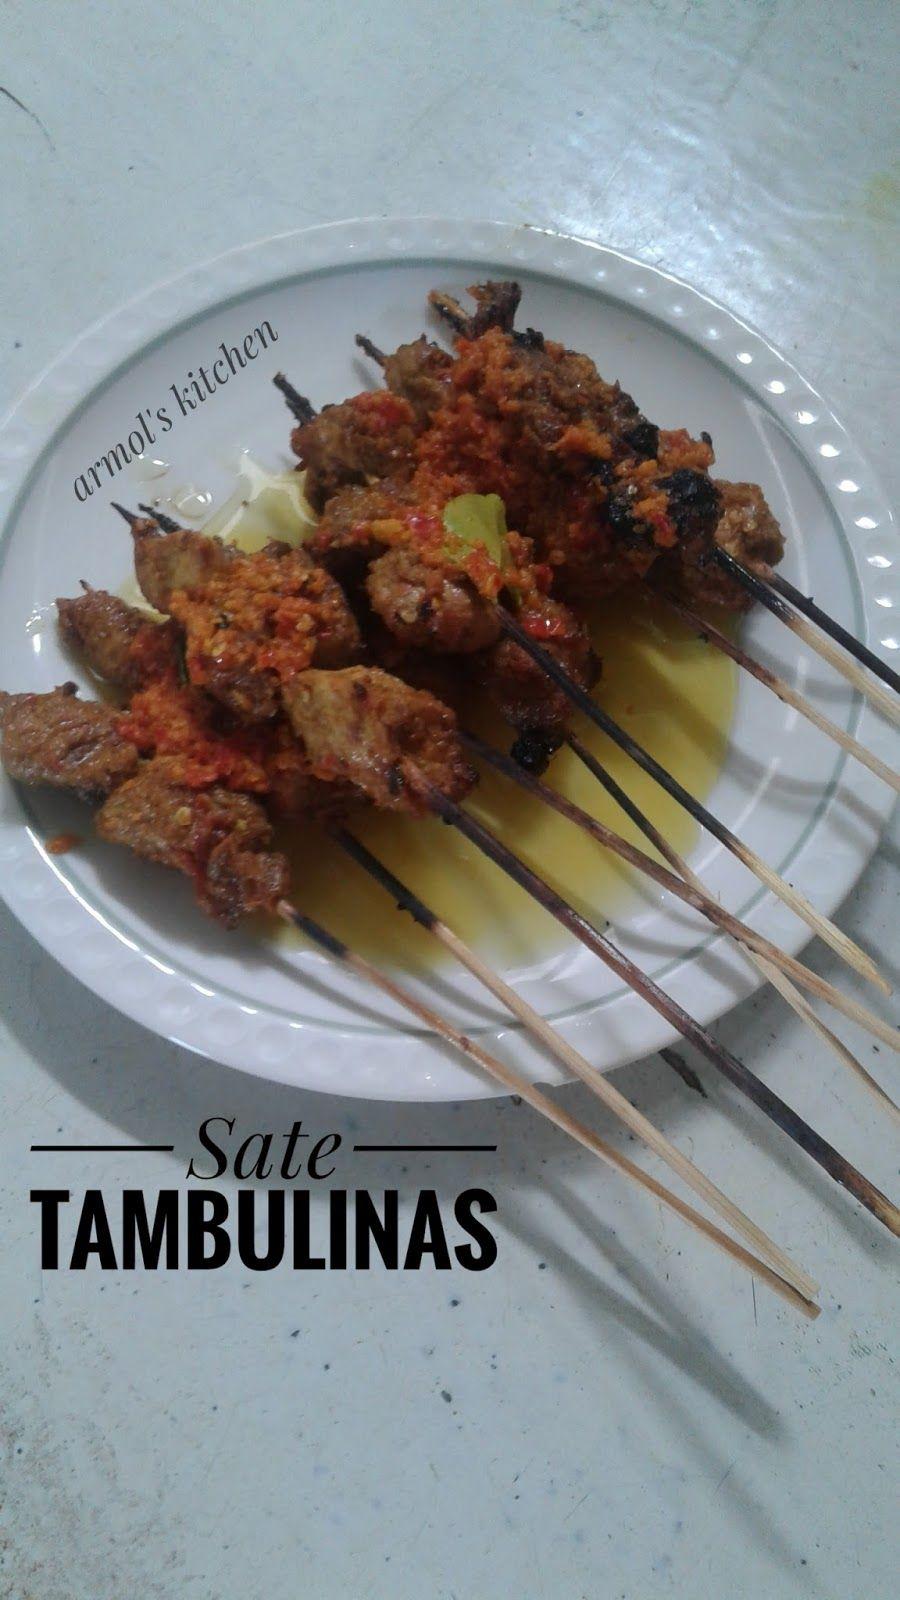 Resep Sate Tambulinas Resep Resep Masakan Resep Makanan